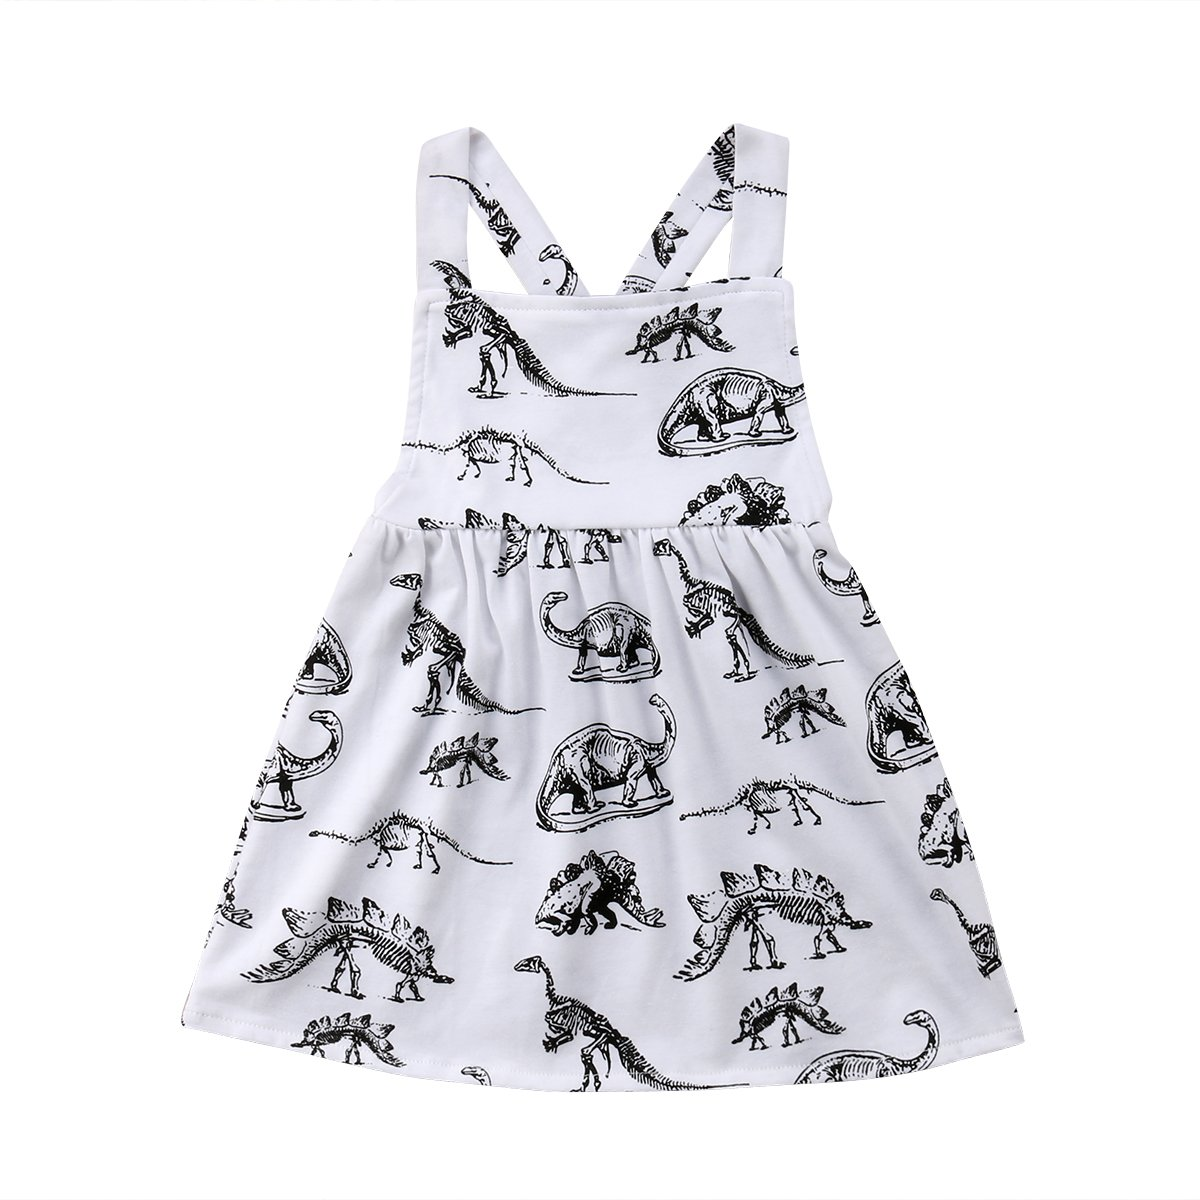 yannzi Baby Girls Dinosaur Dress Clothes Ruffle Sleeve Tutu Skirt Backless Sundress Birthday Party Princess Formal Outfit (6-12 Months, Dinosaur)